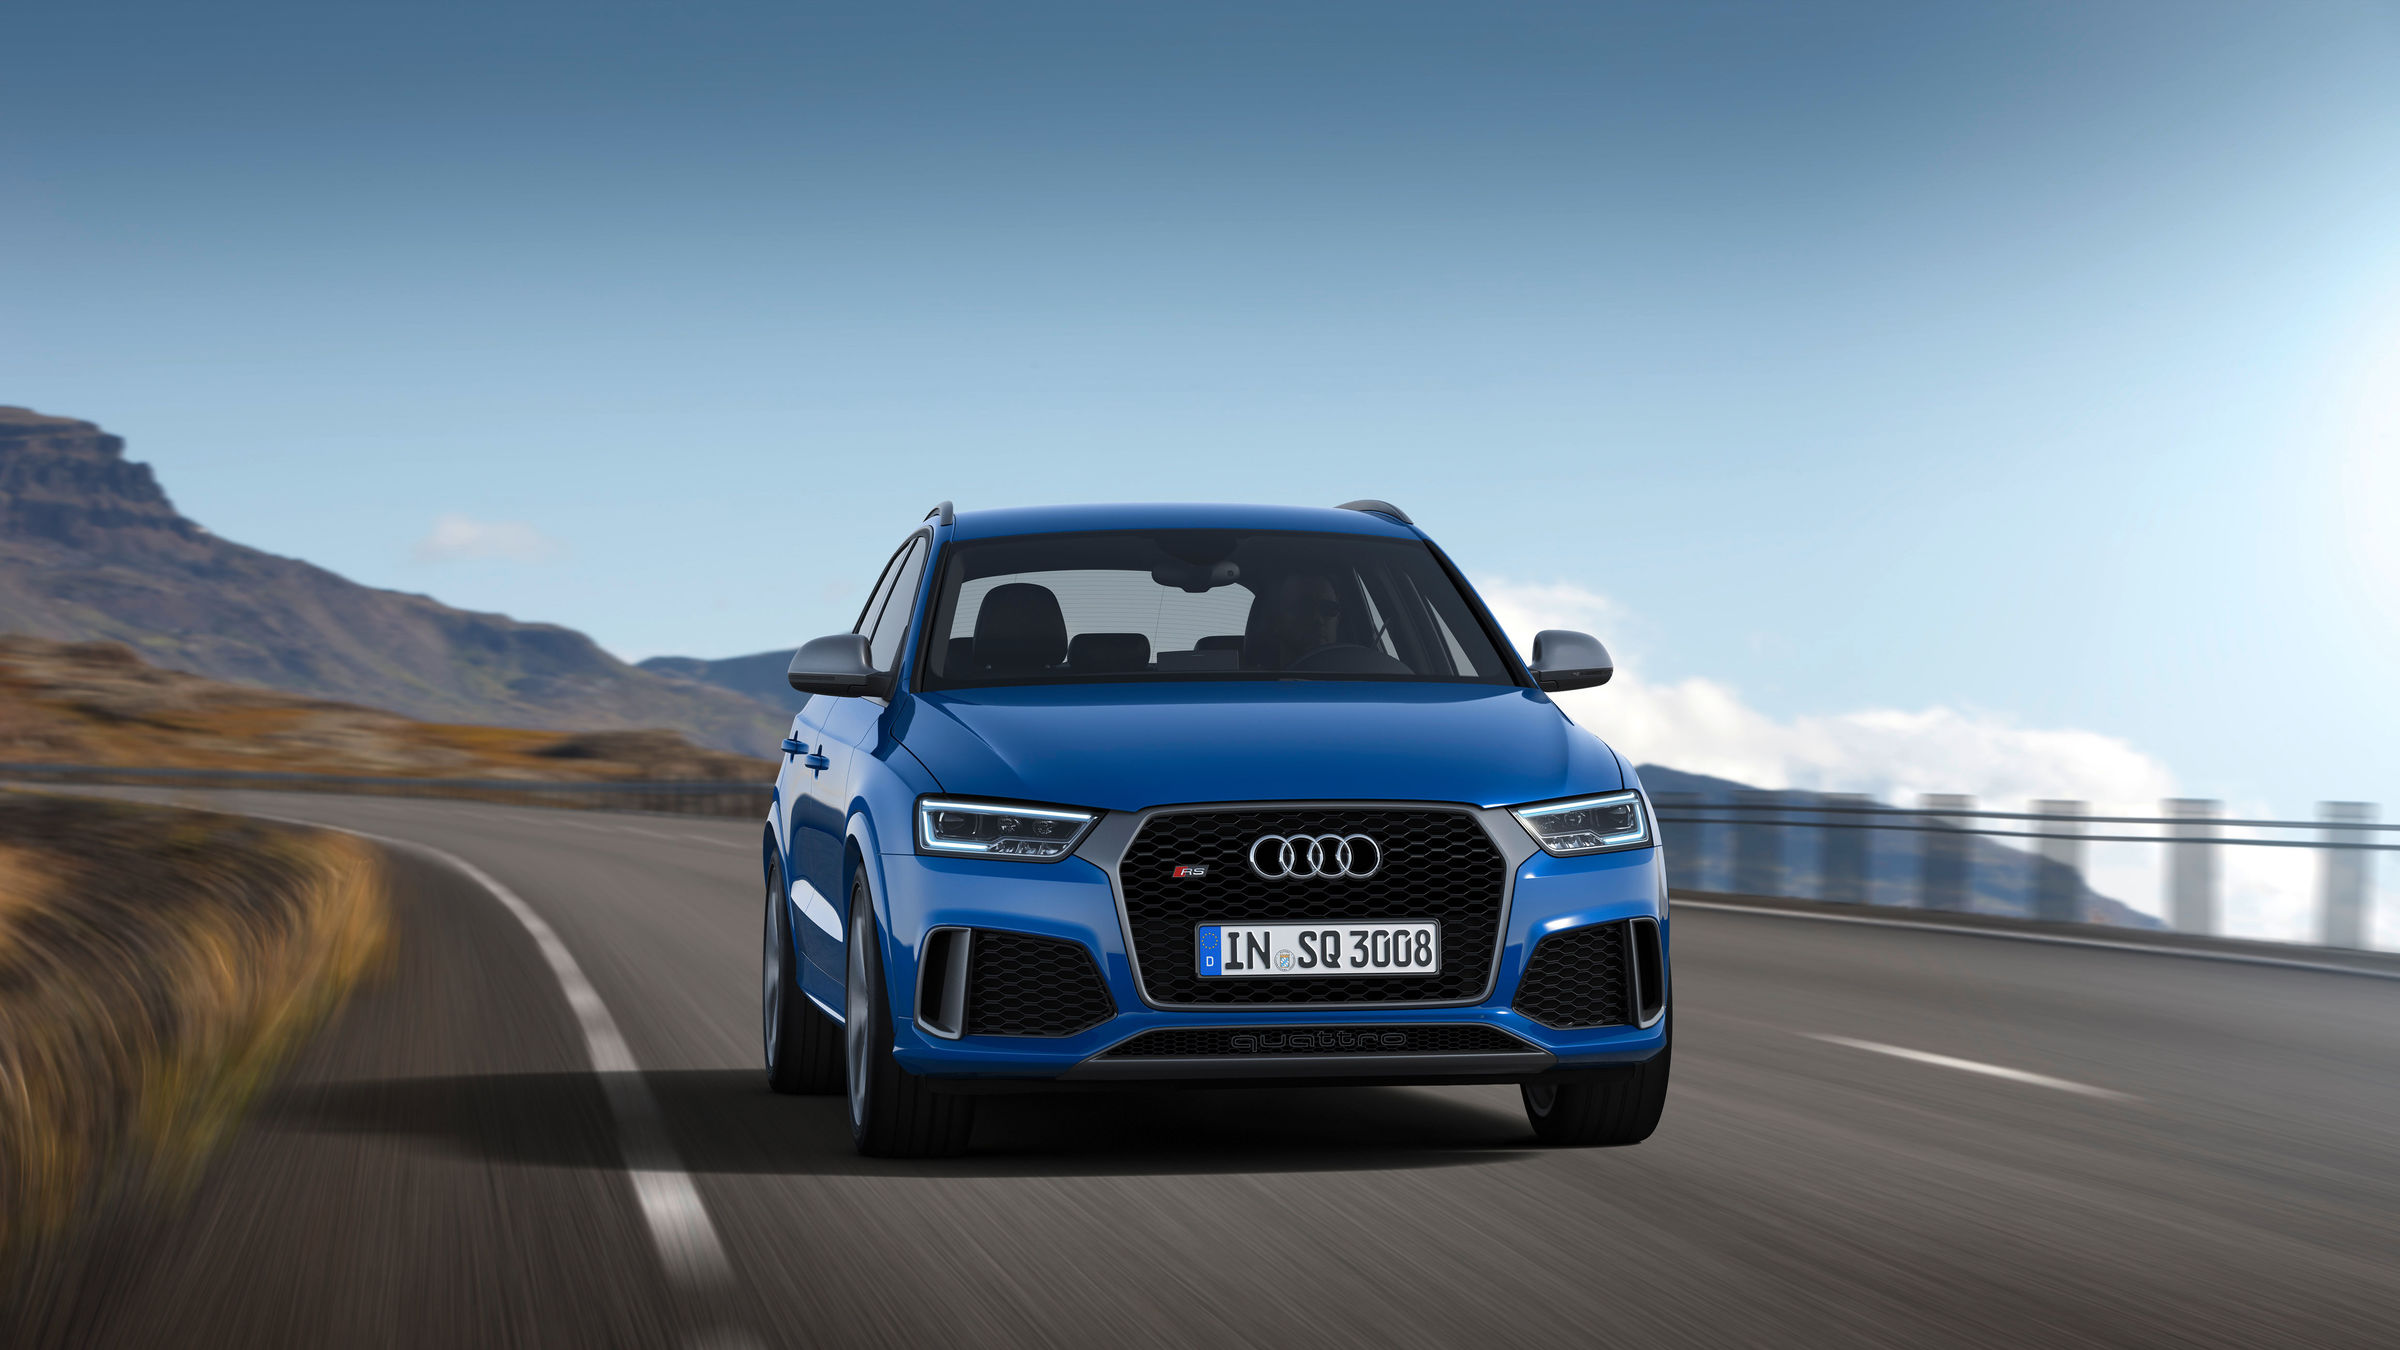 Leistung pur: der Audi RS Q3 performance (2016)   Audi MediaCenter